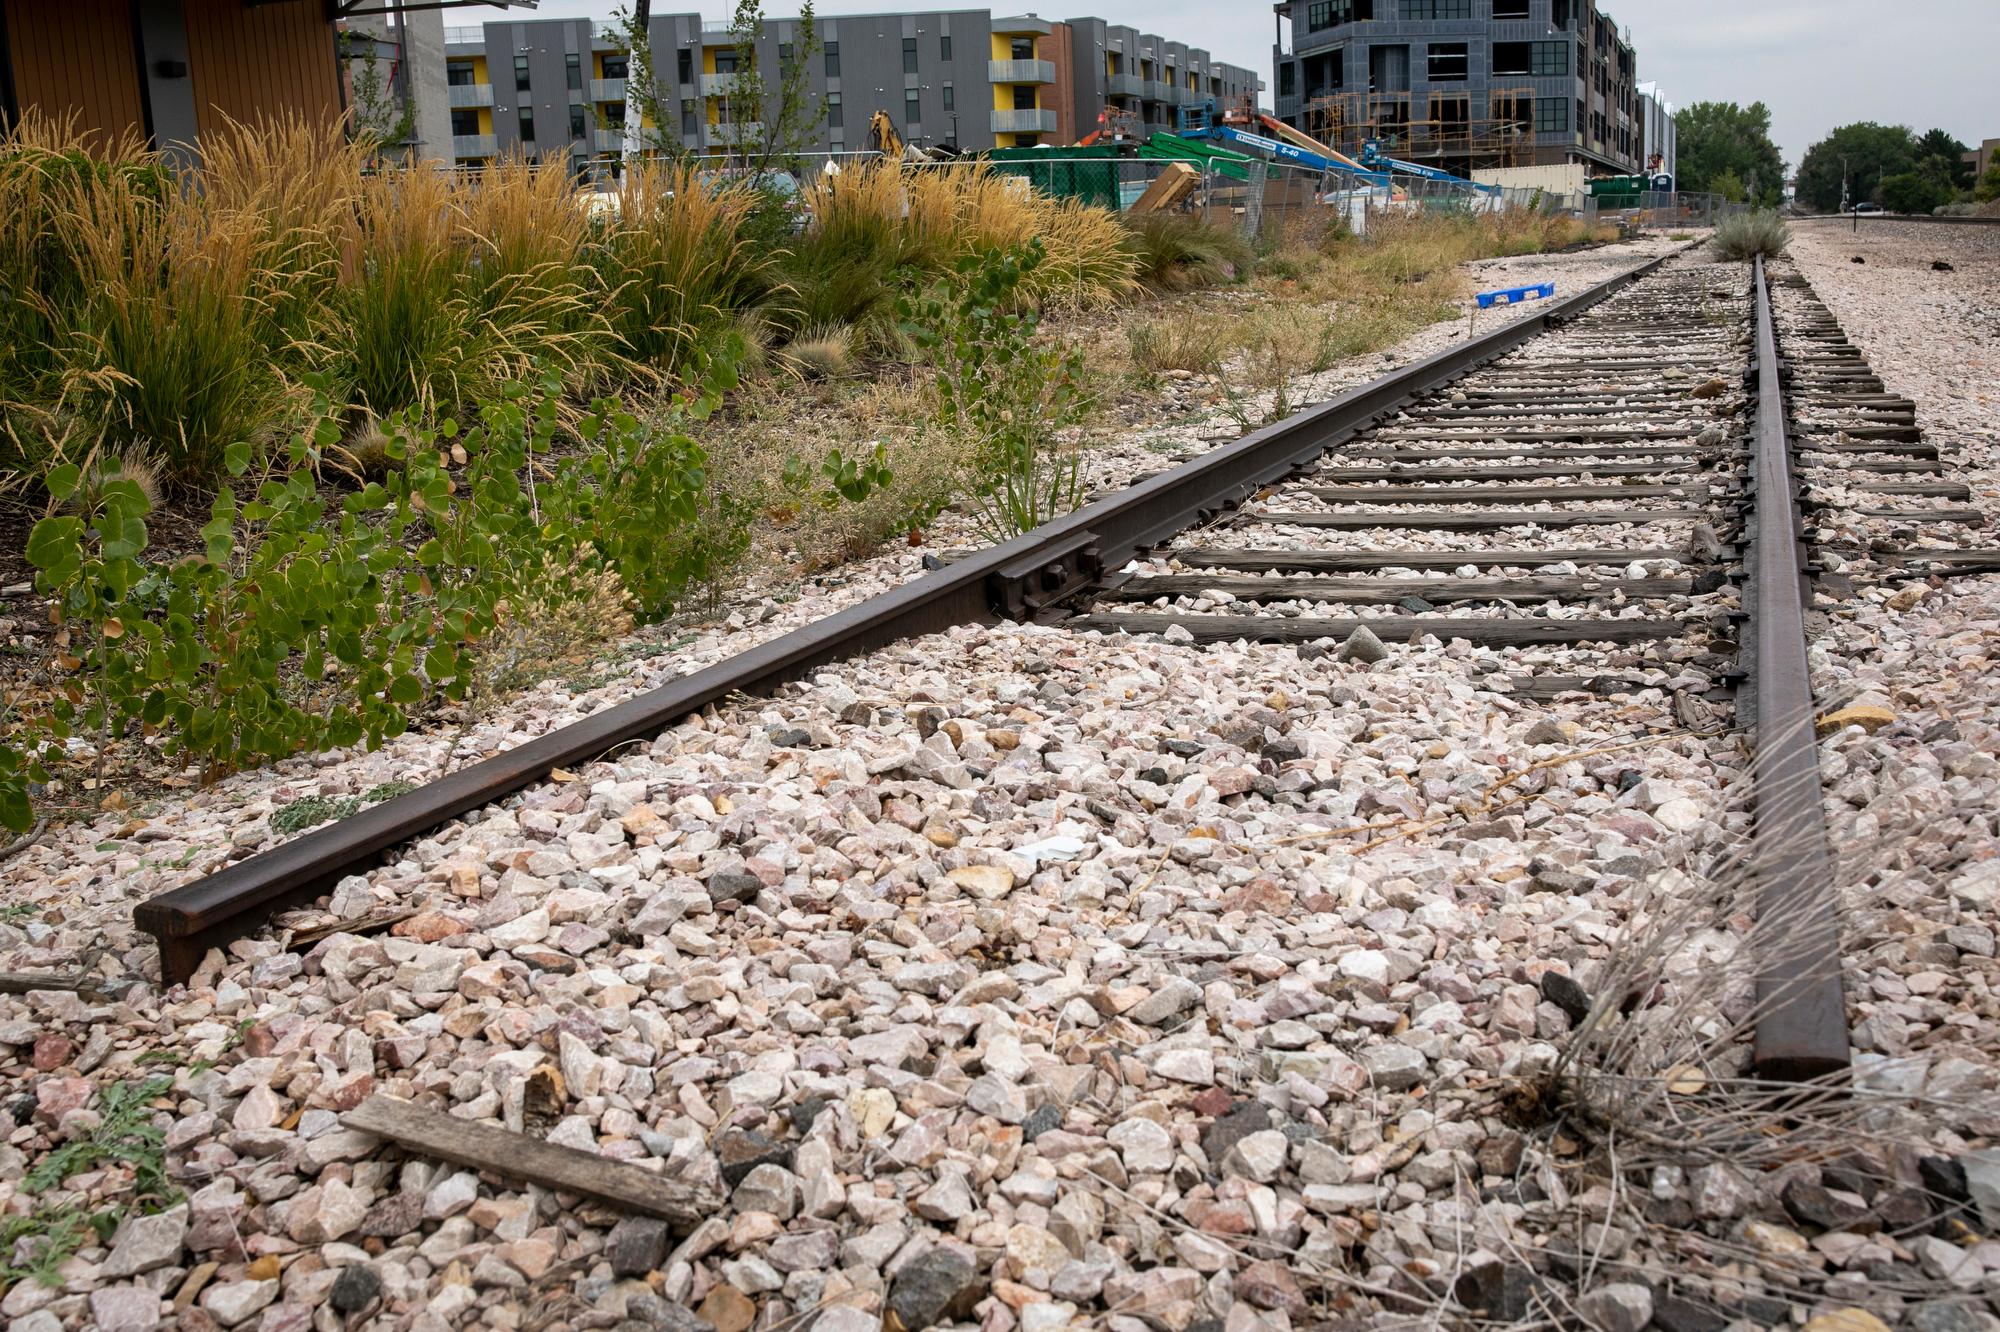 200910-RTD-BOULDER-TRAIN-